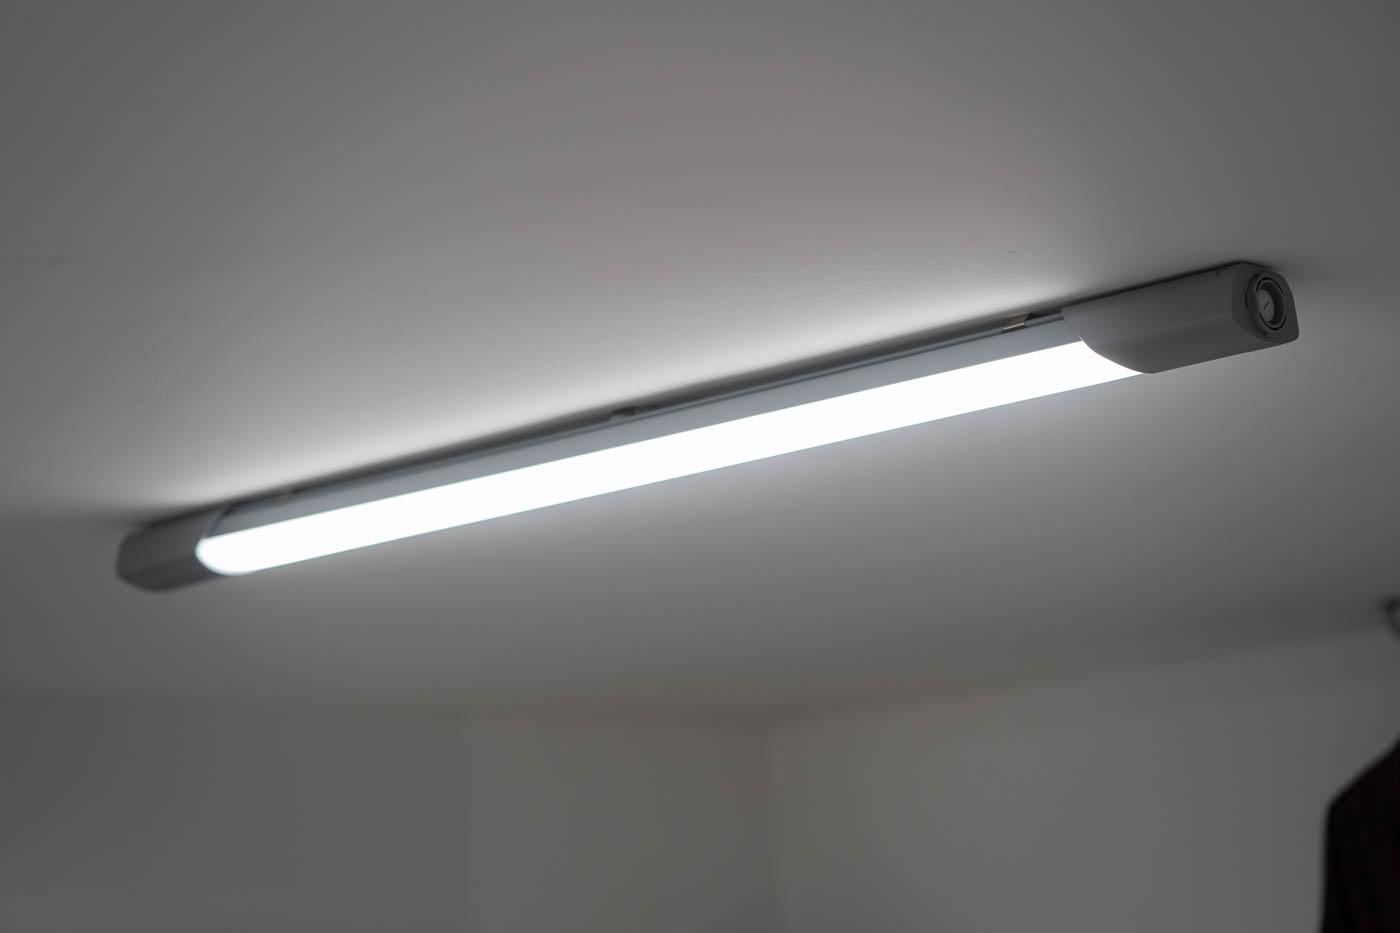 RS PRO Connect 5100 LED Sensor